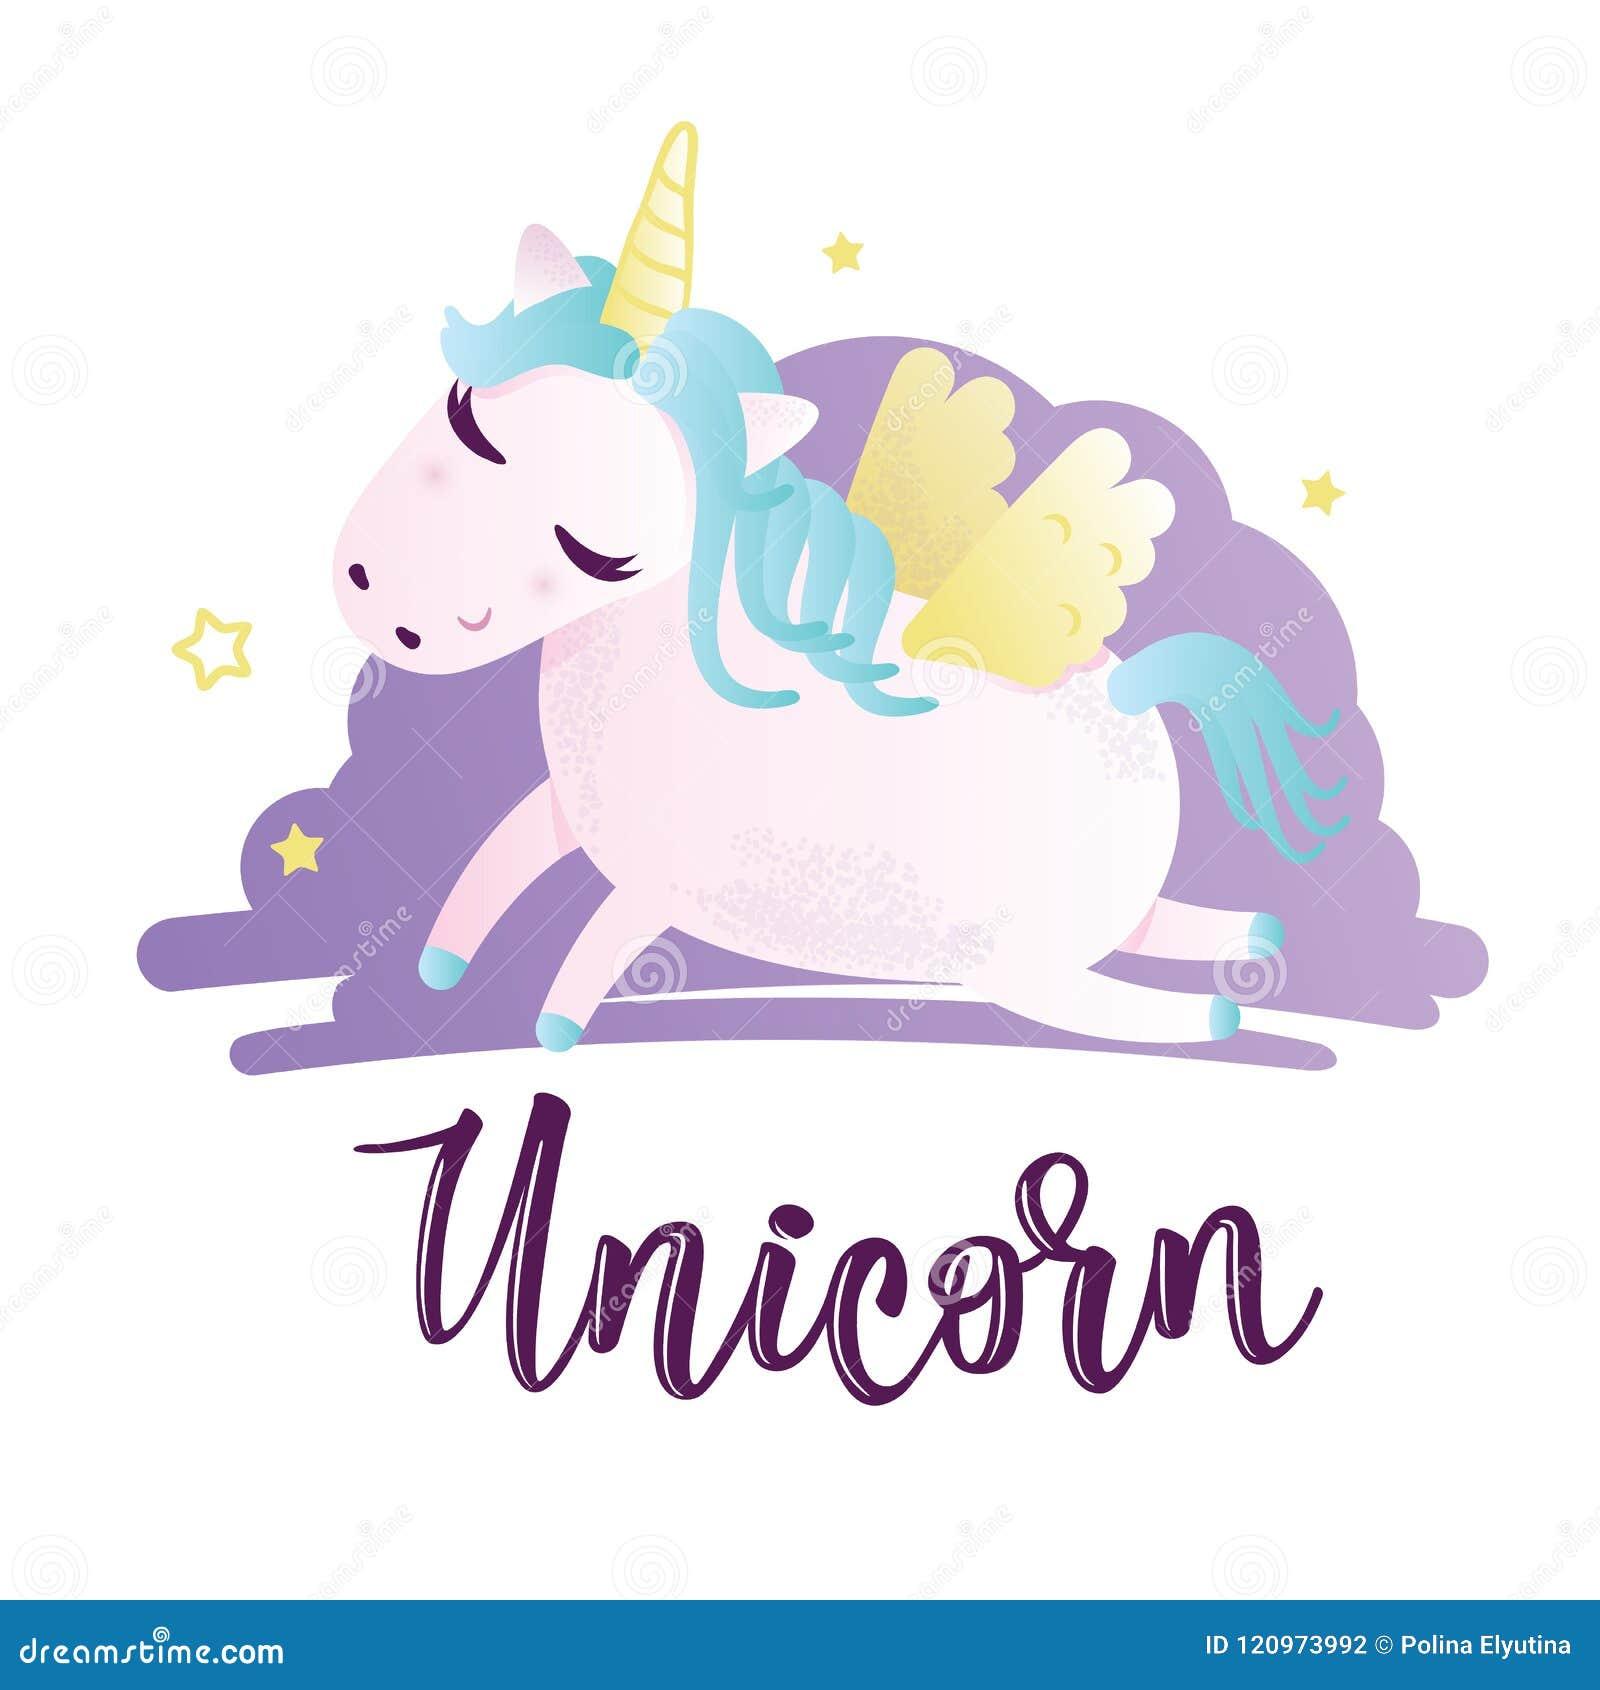 Greeting Card With Unicorn Inscription Stock Vector Illustration